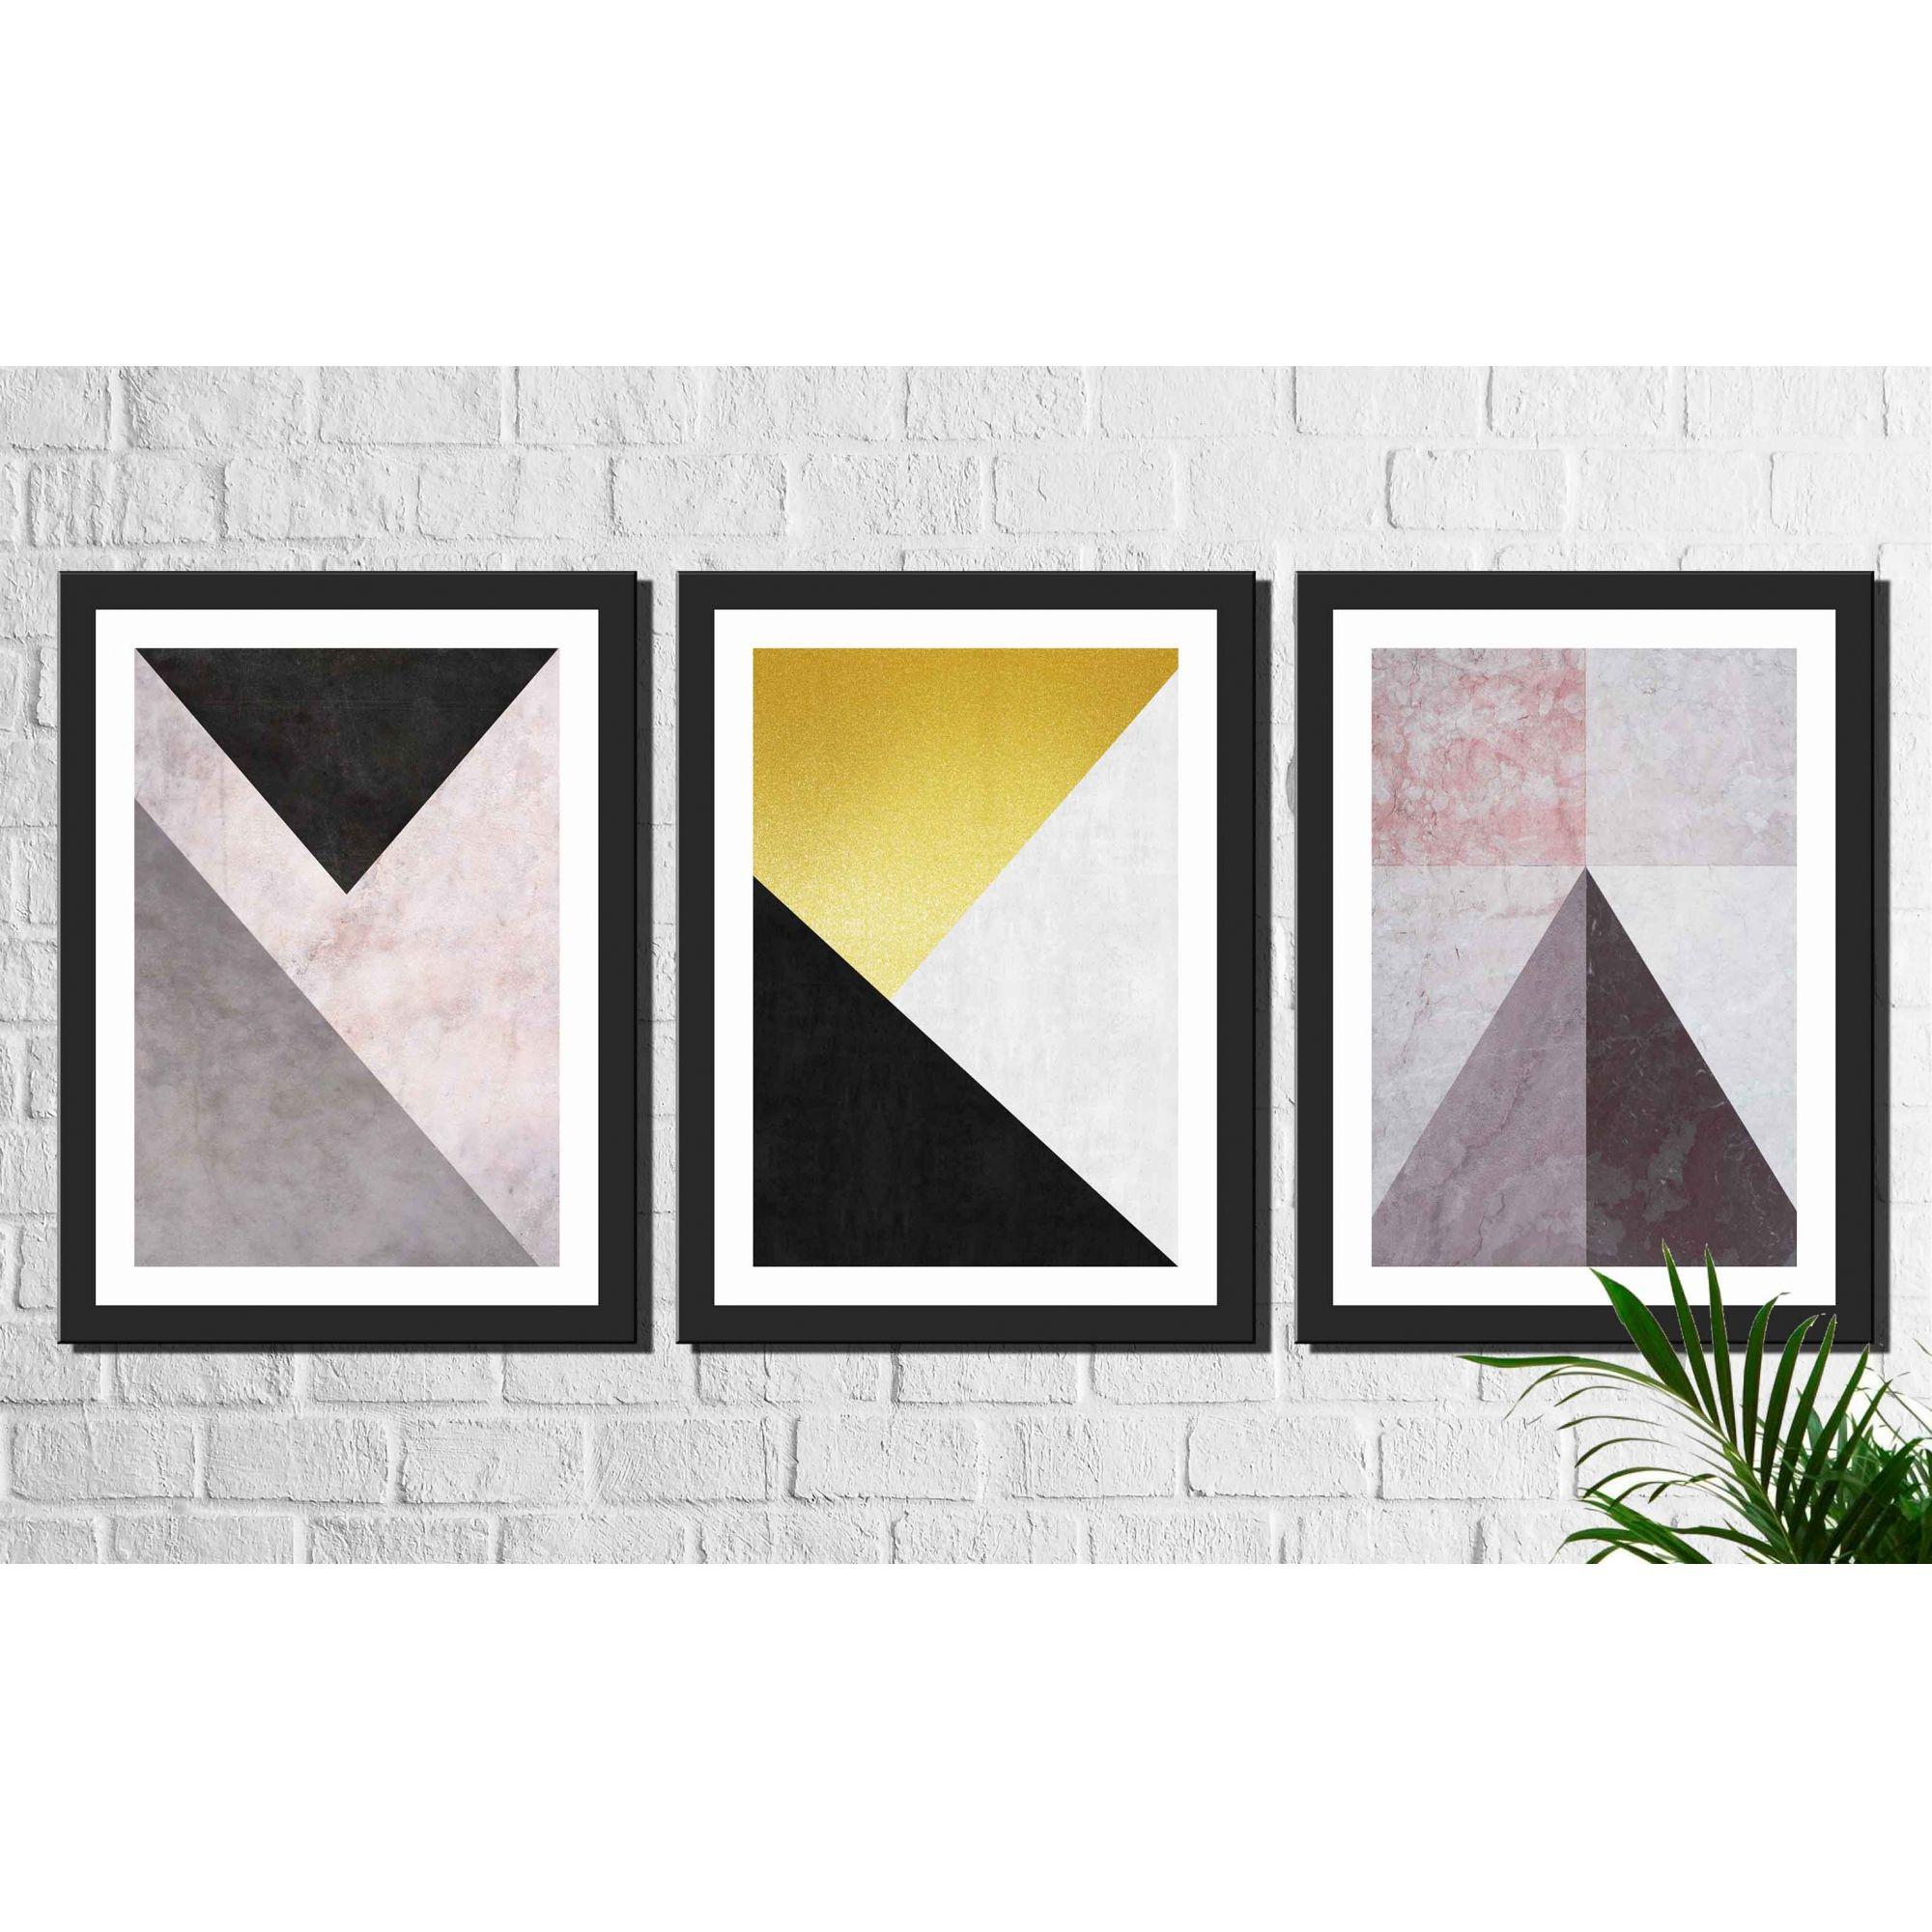 Kit 3 Quadros Decorativos Geométrico Triângulos